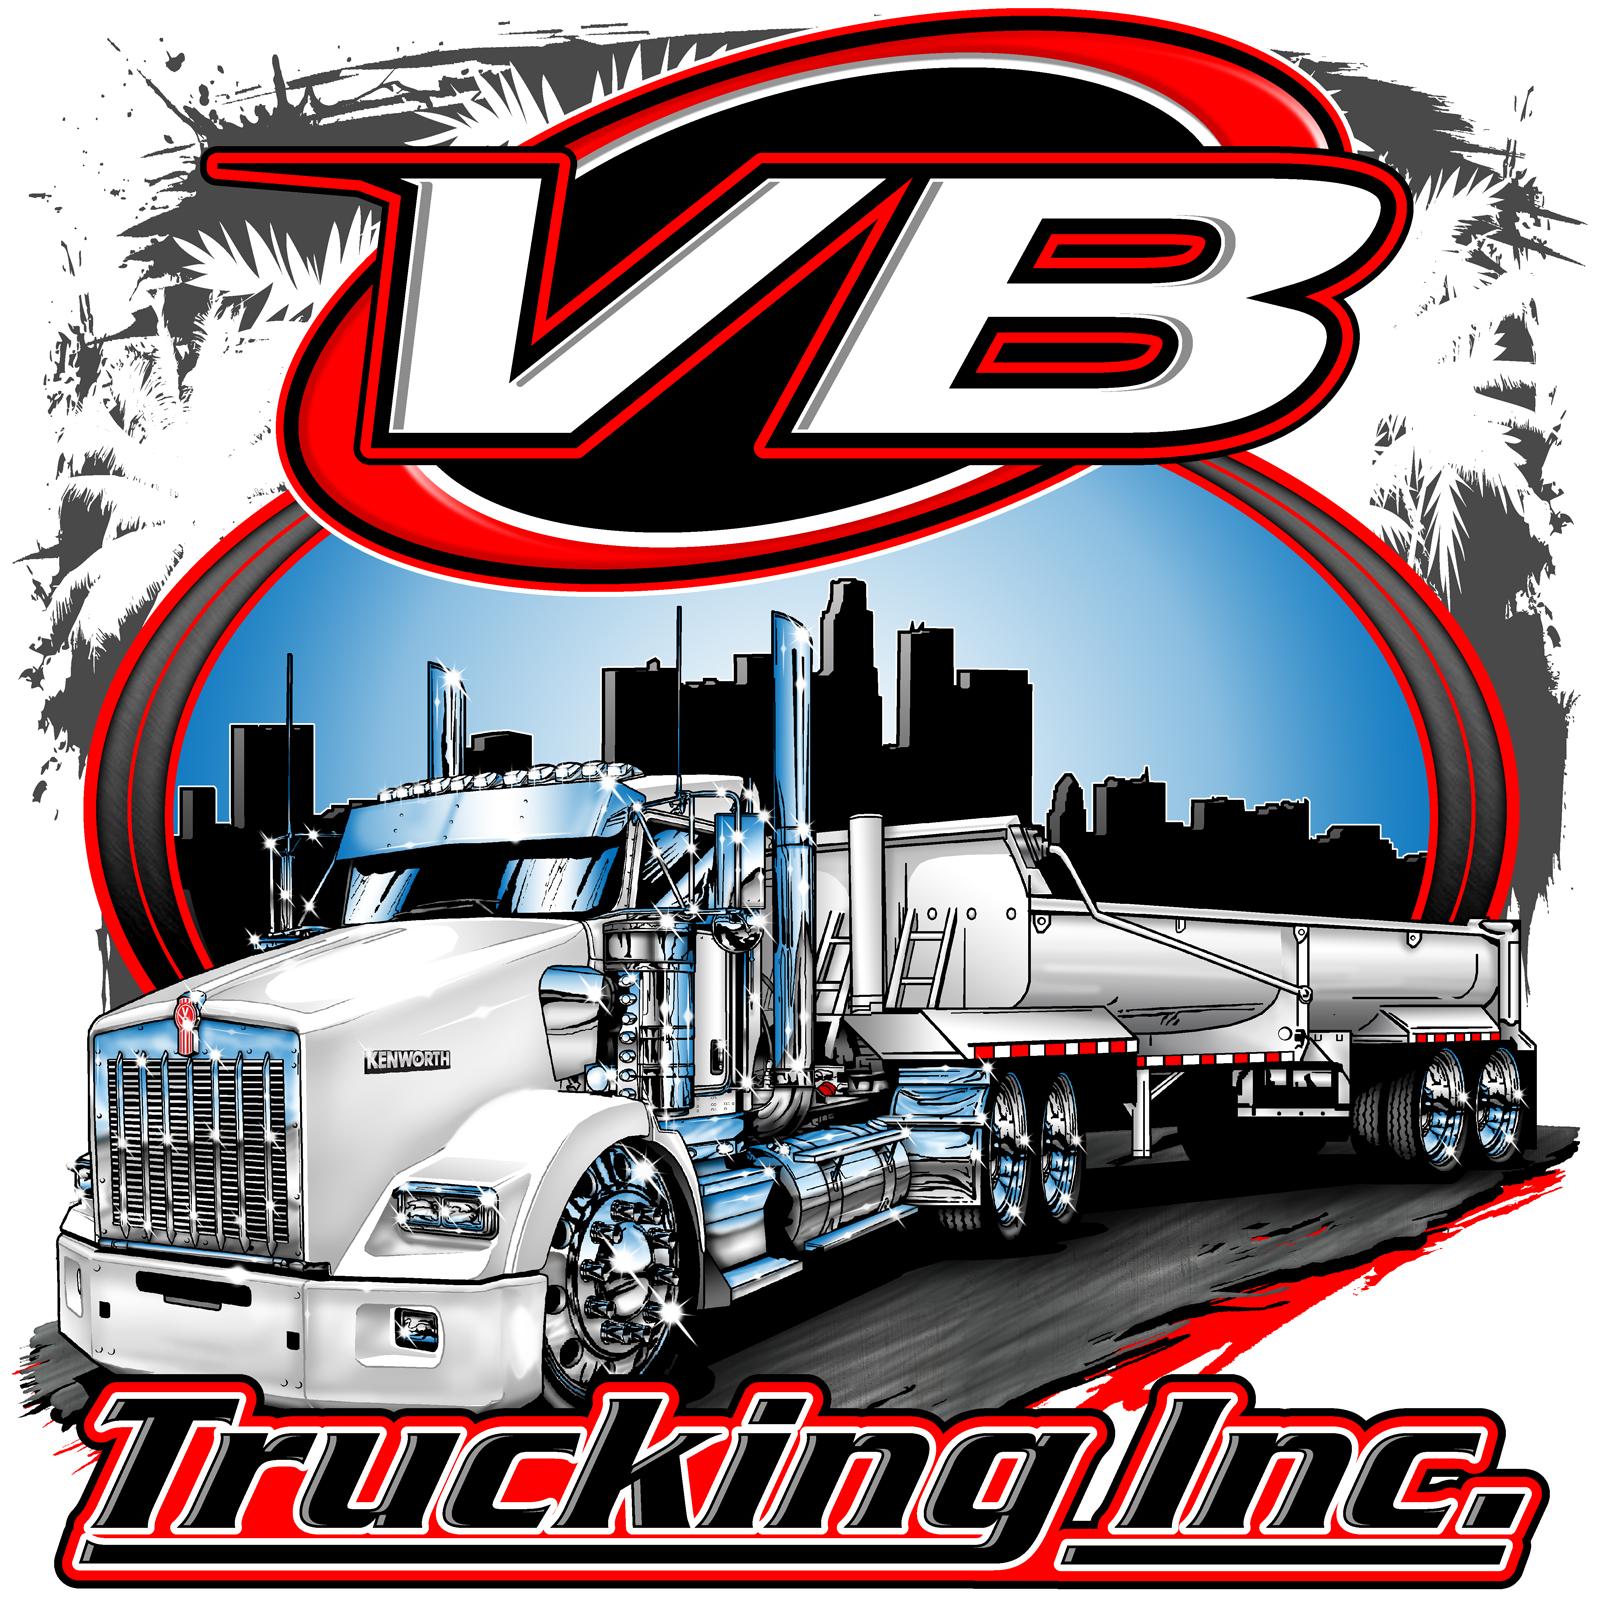 VB Trucking Logo